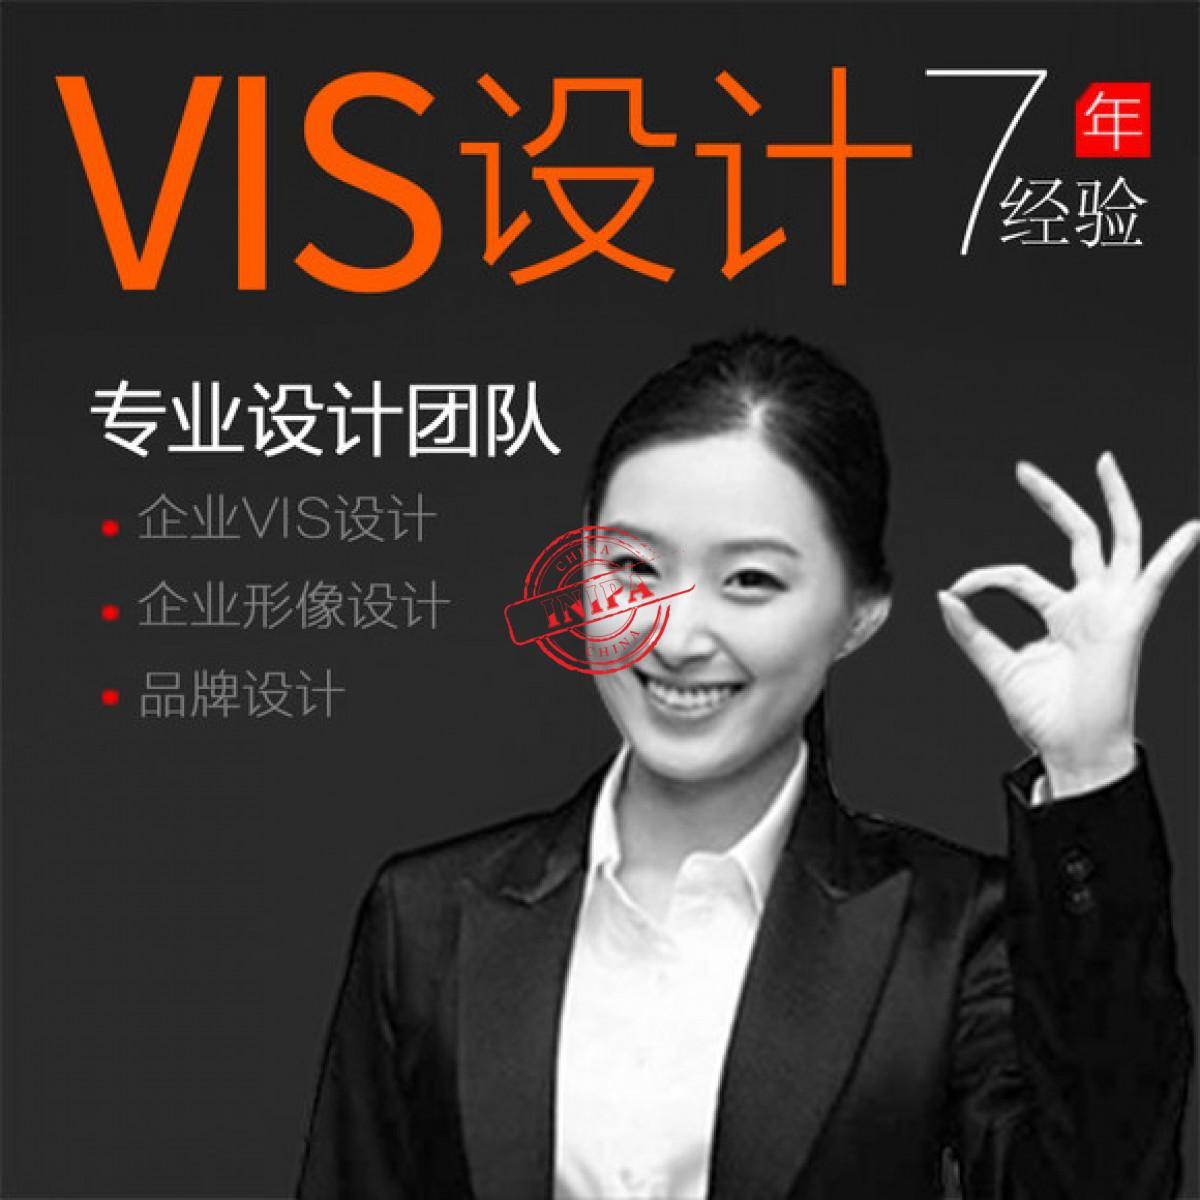 VIS设计/品牌策划